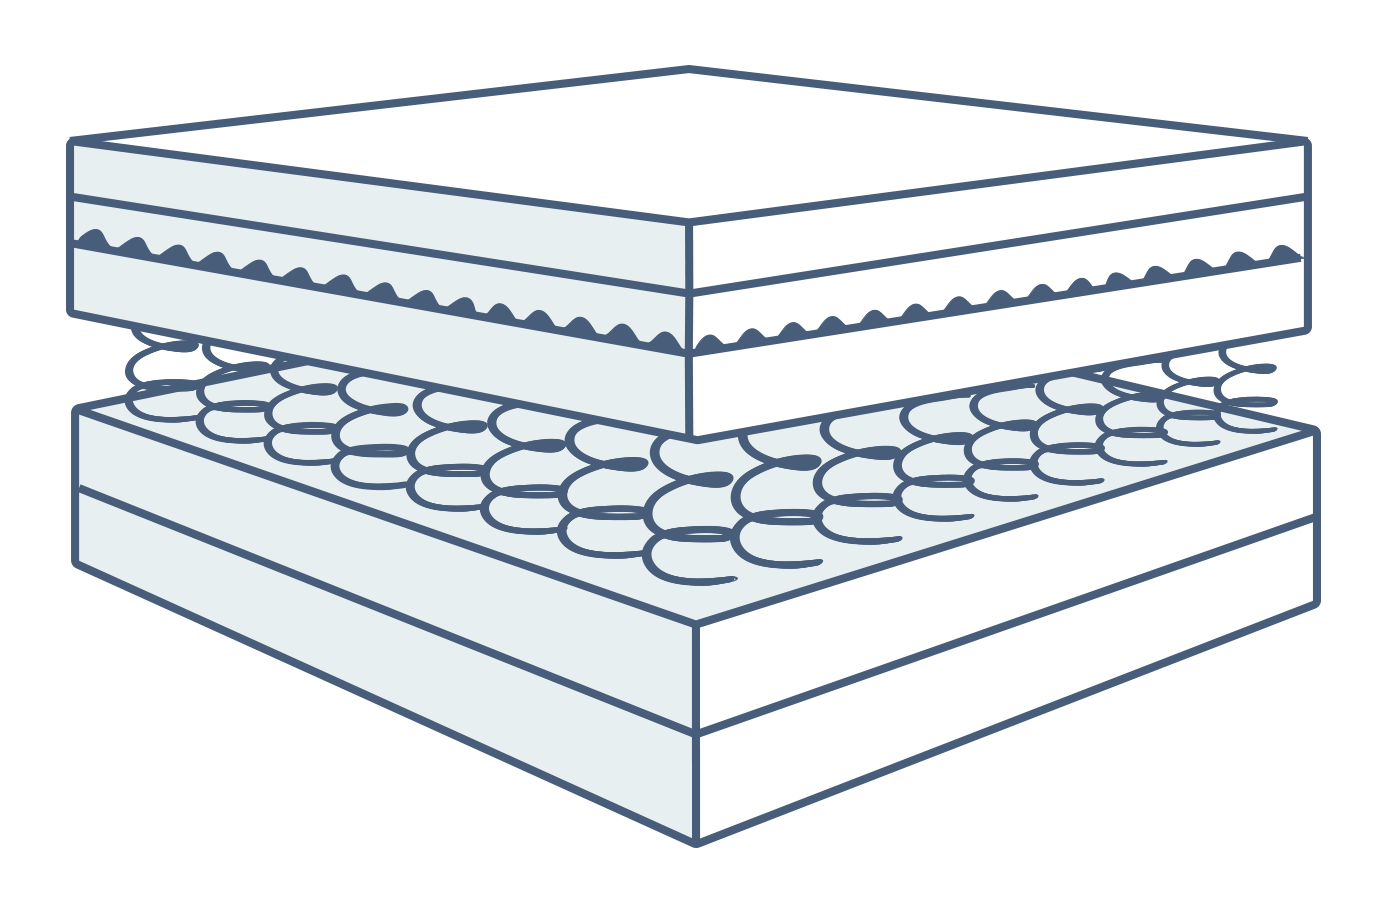 Illustration of an innerspring mattress